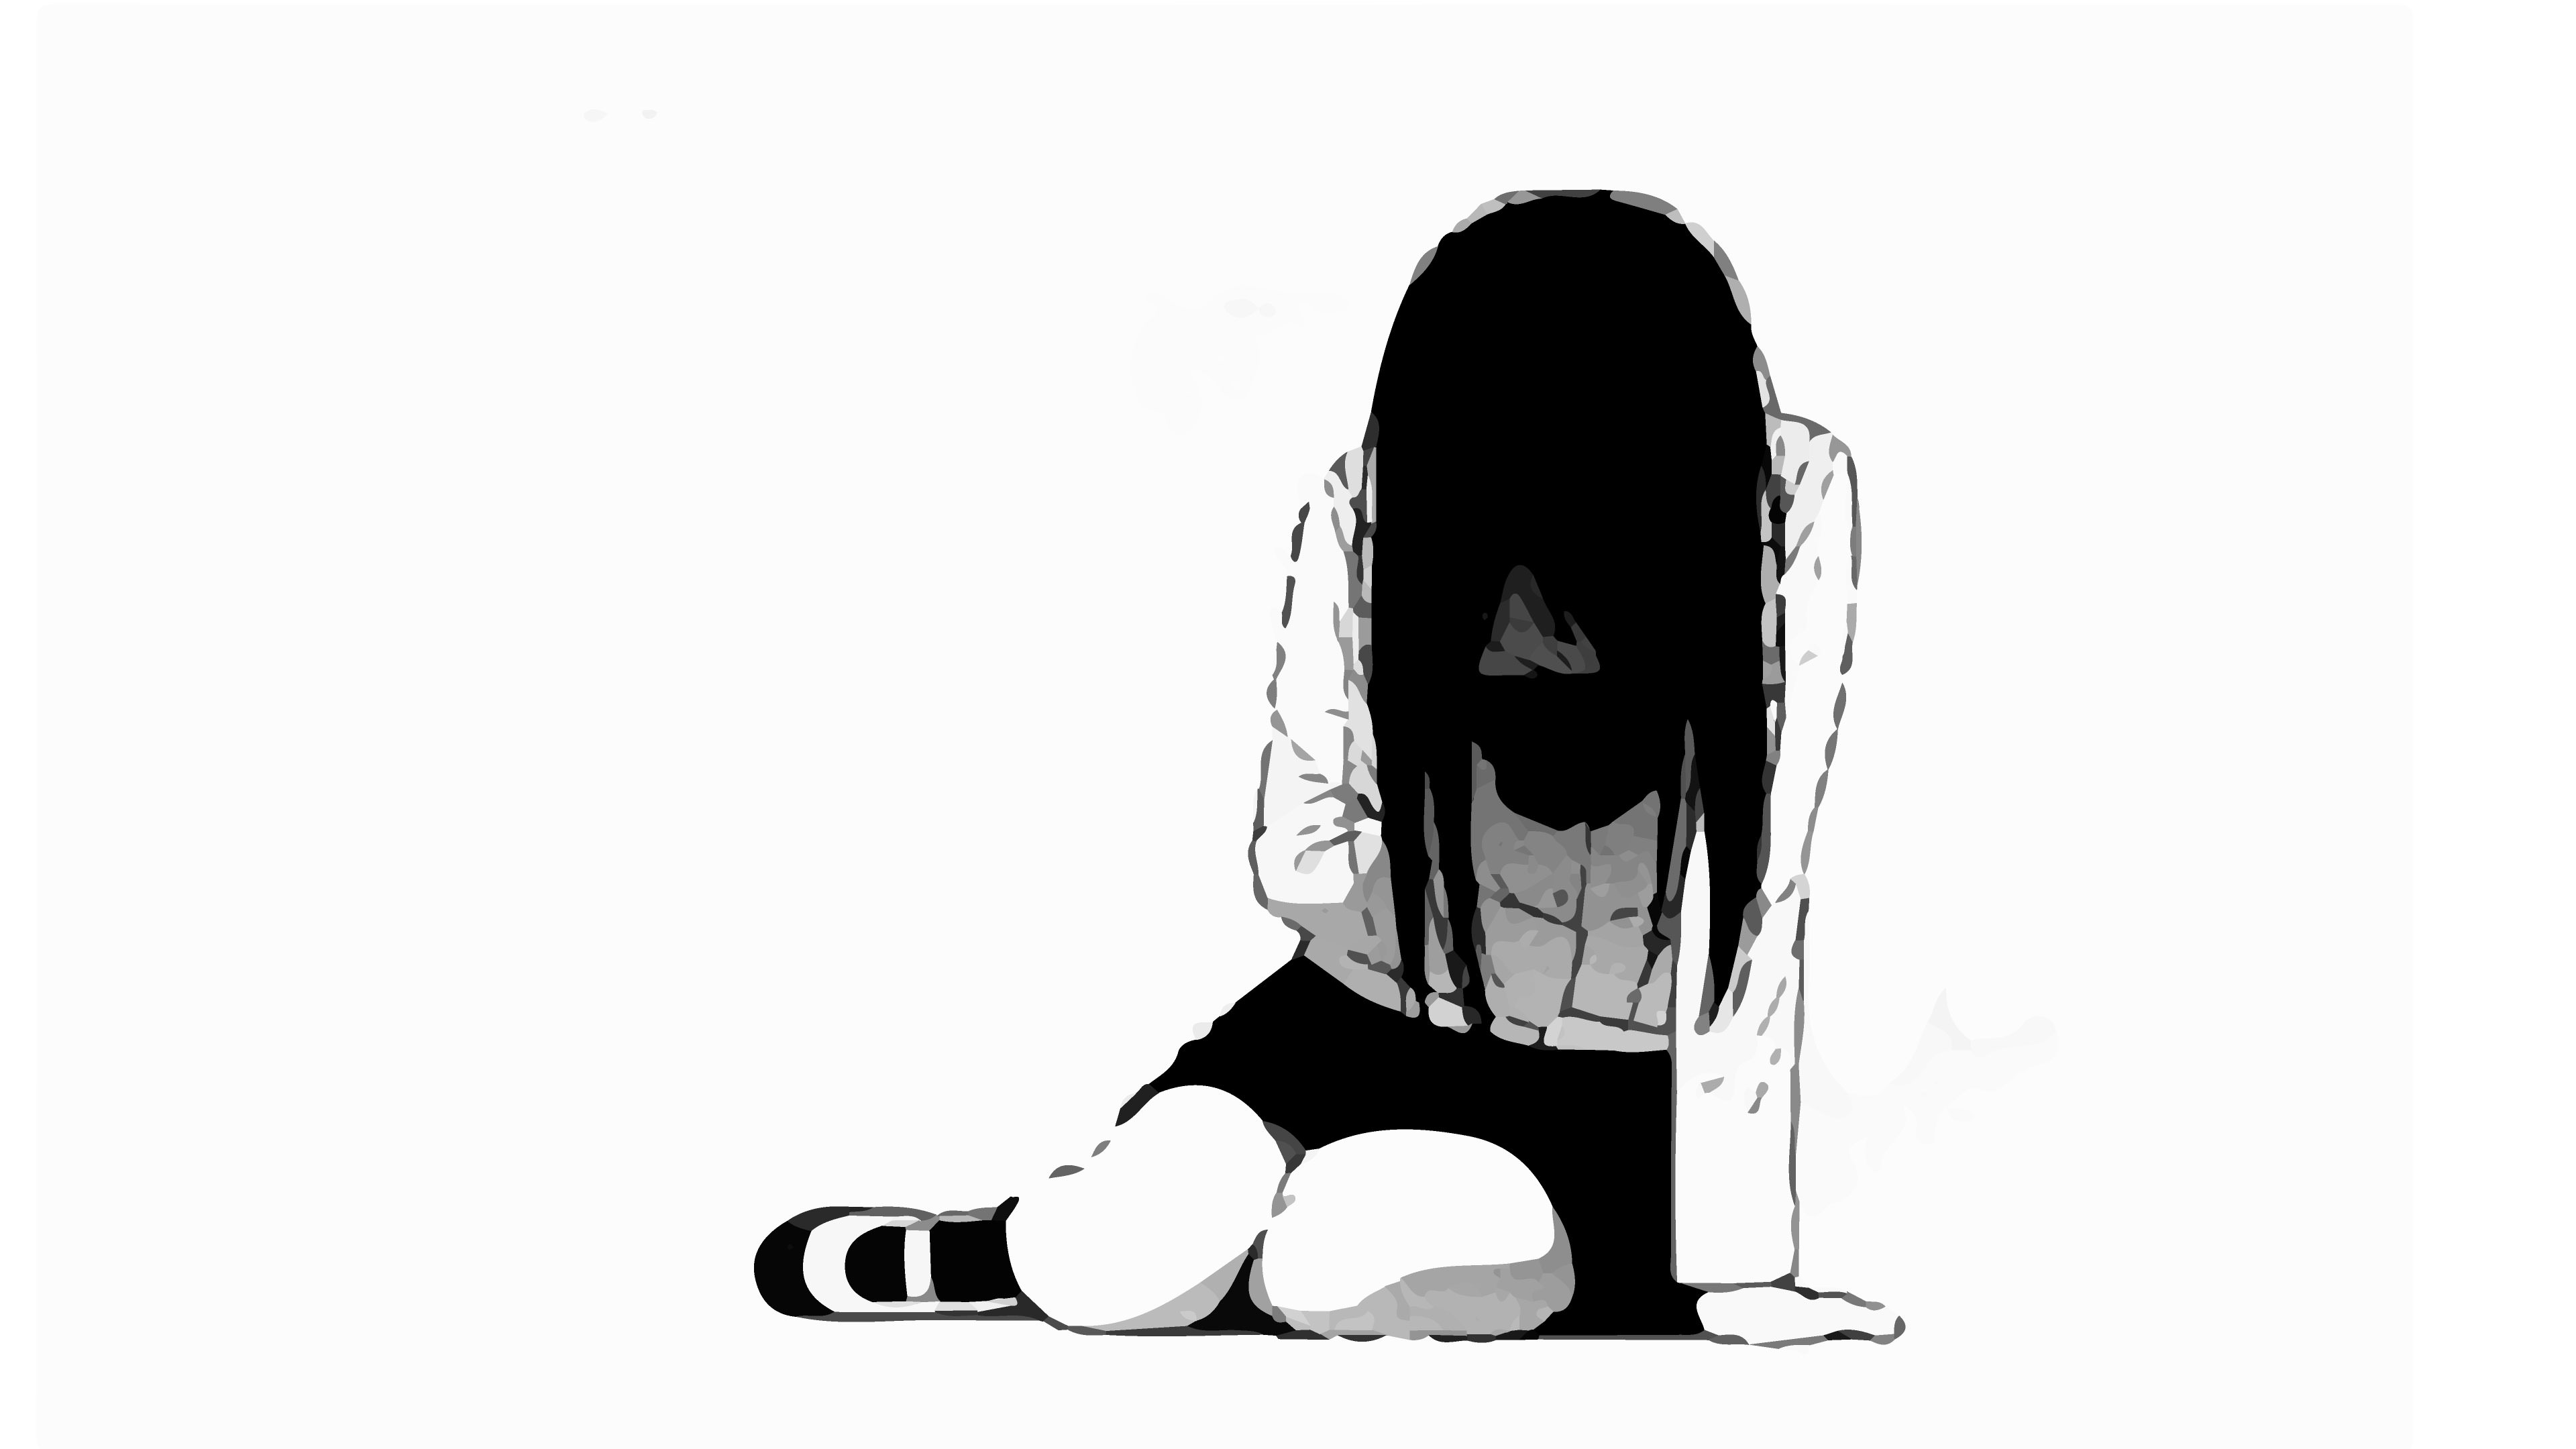 2767x2767 photos depressing anime guys drawing art gallery